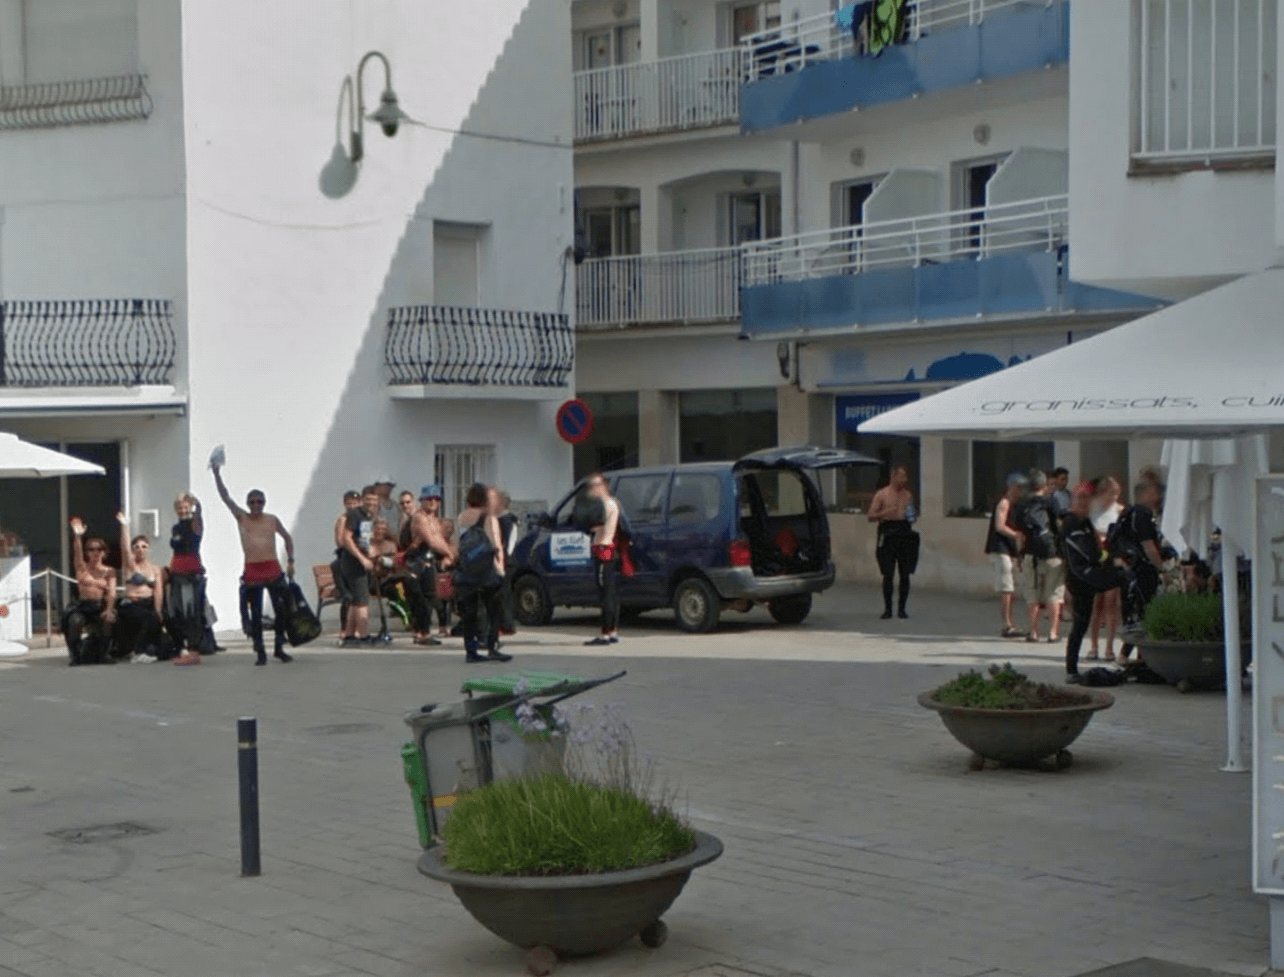 Plongée les illes estartit hotel costa brava illes medes